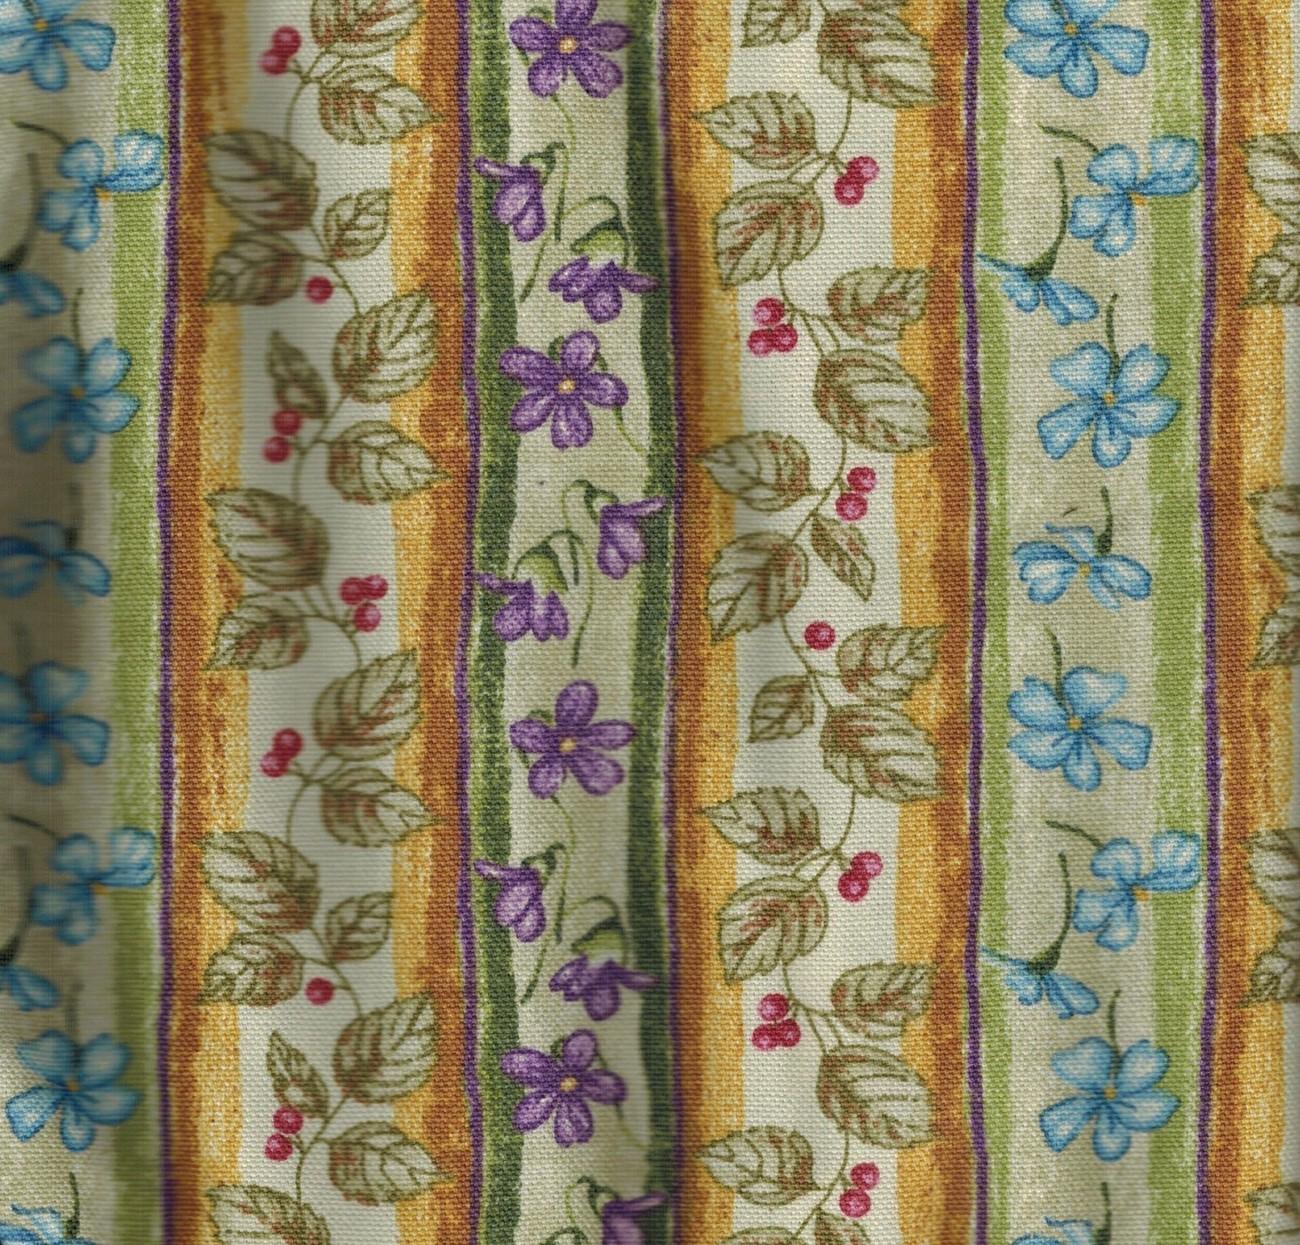 Longaberger Medium Oval Gathering Basket Liner ~ Botanical Fields Stripe Fabric